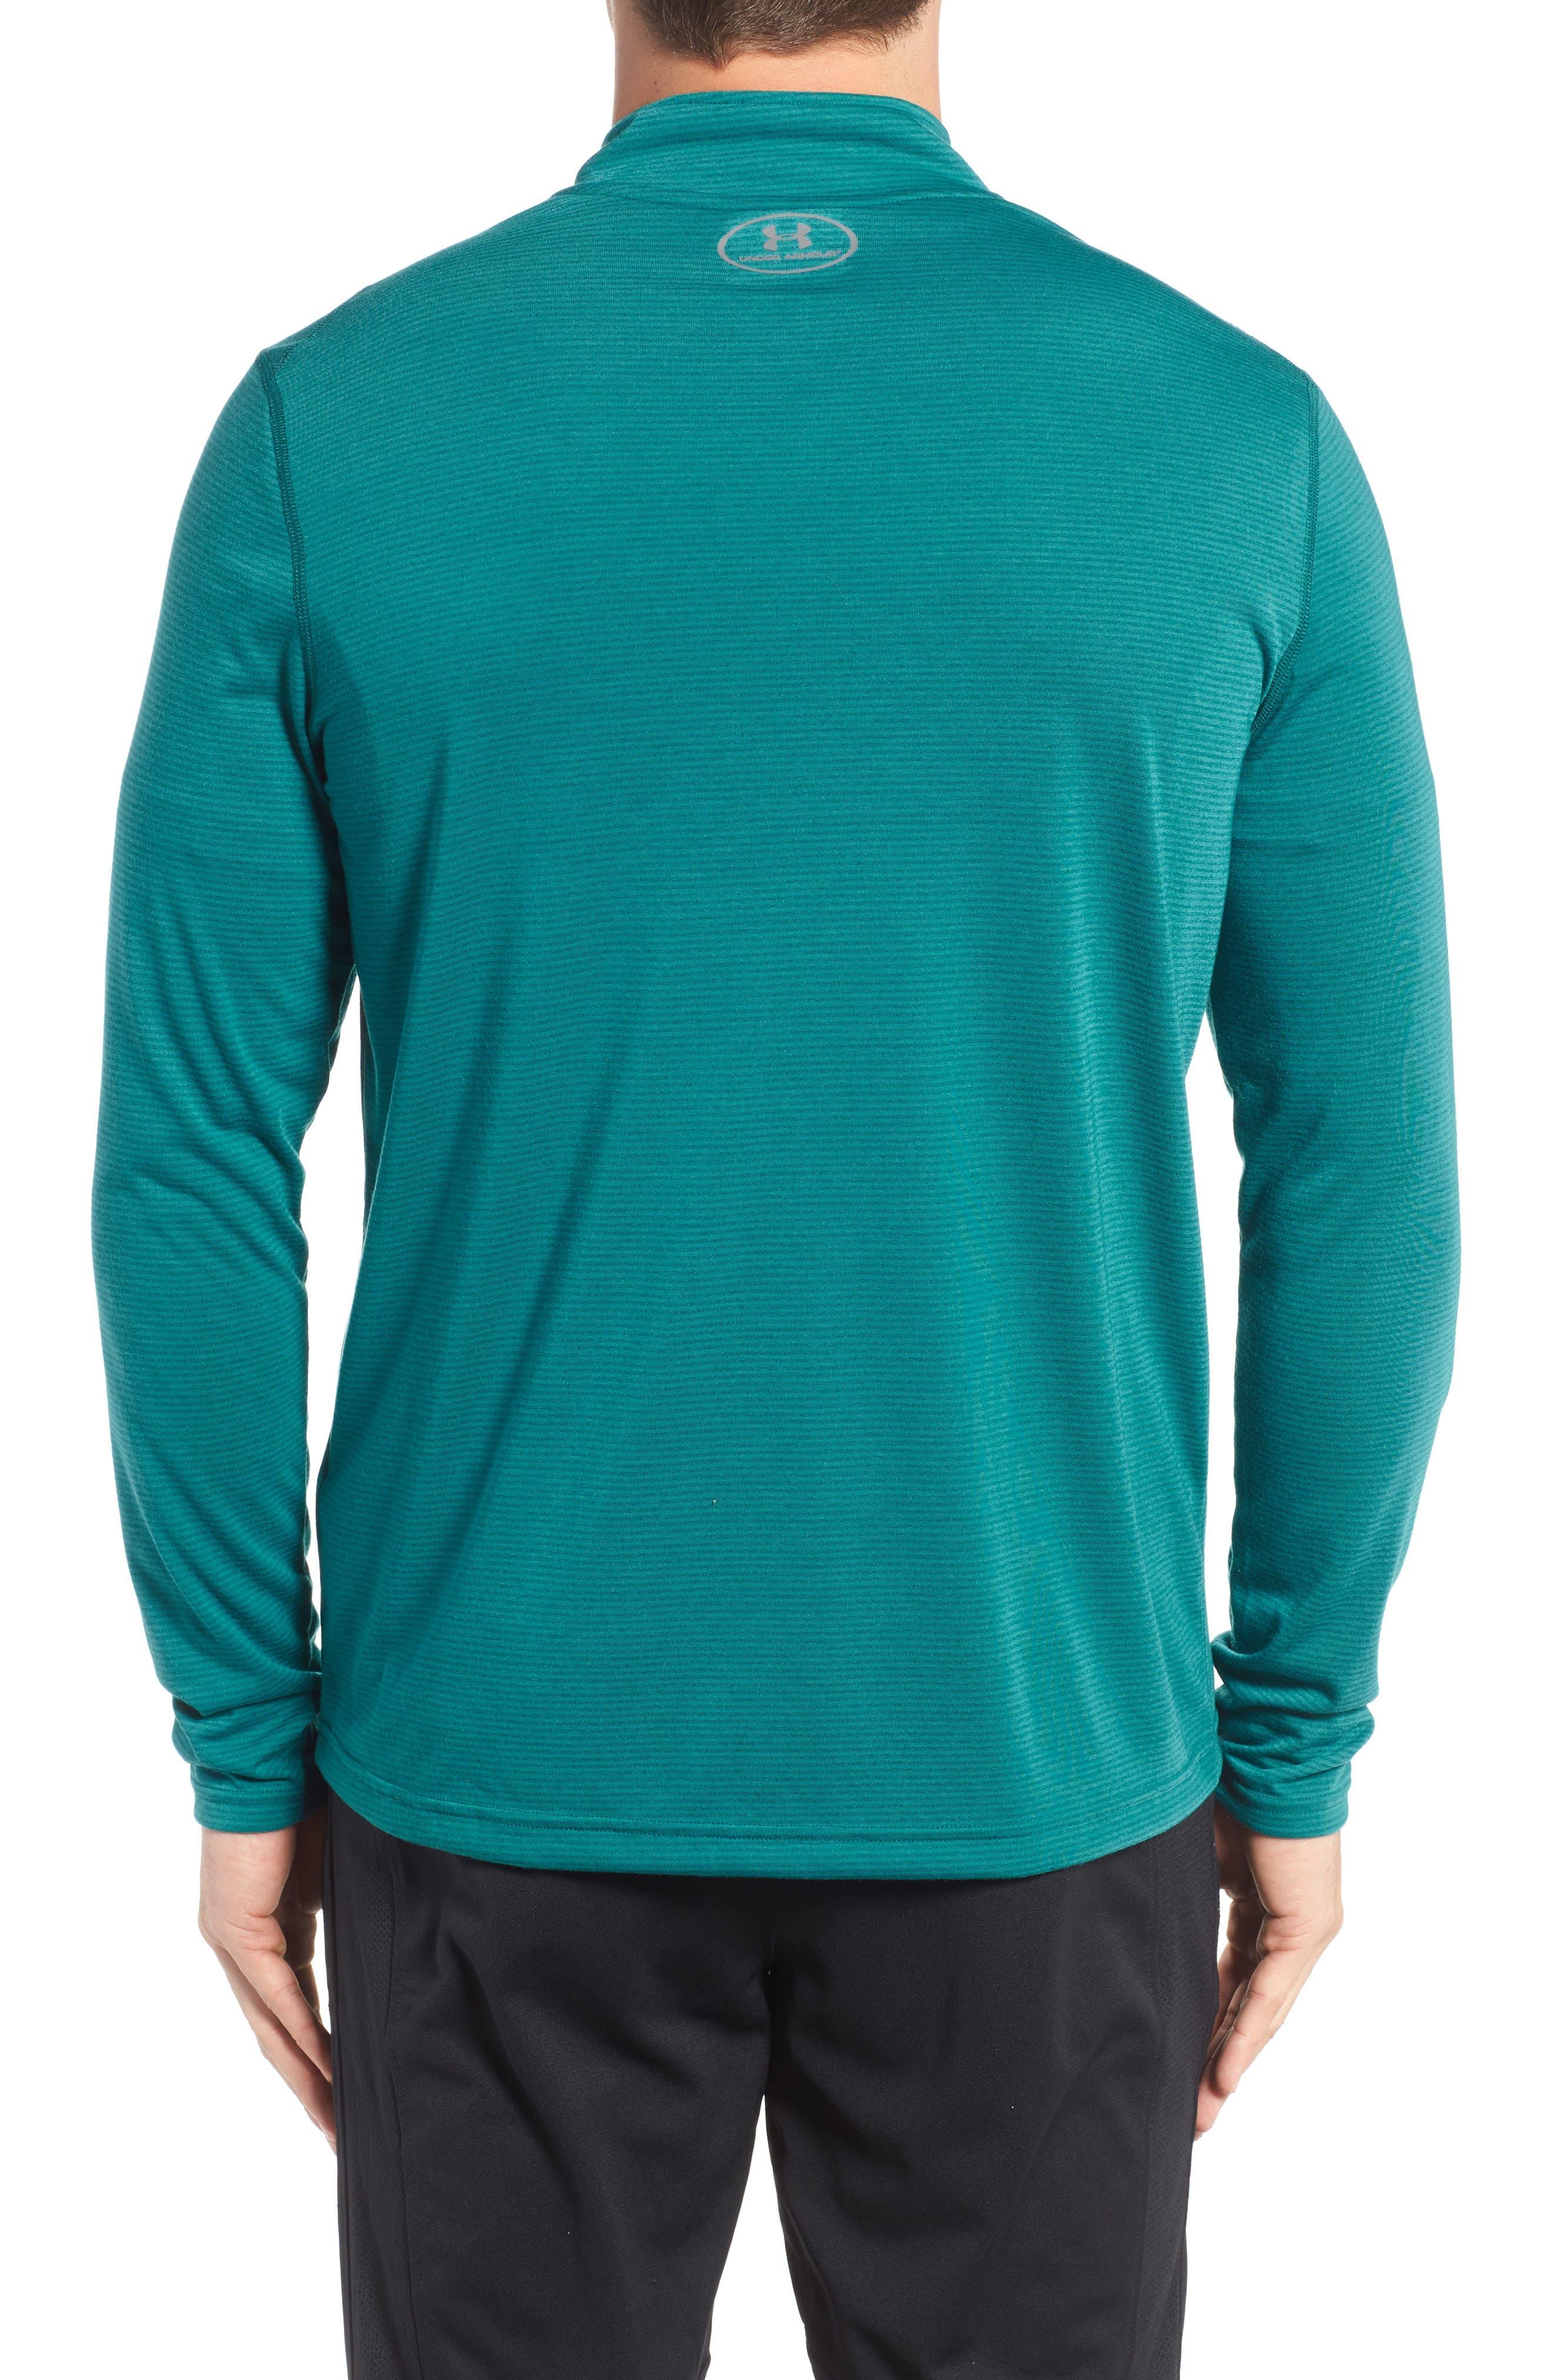 Threadborne Quarter-Zip Performance Shirt,                             Alternate thumbnail 23, color,